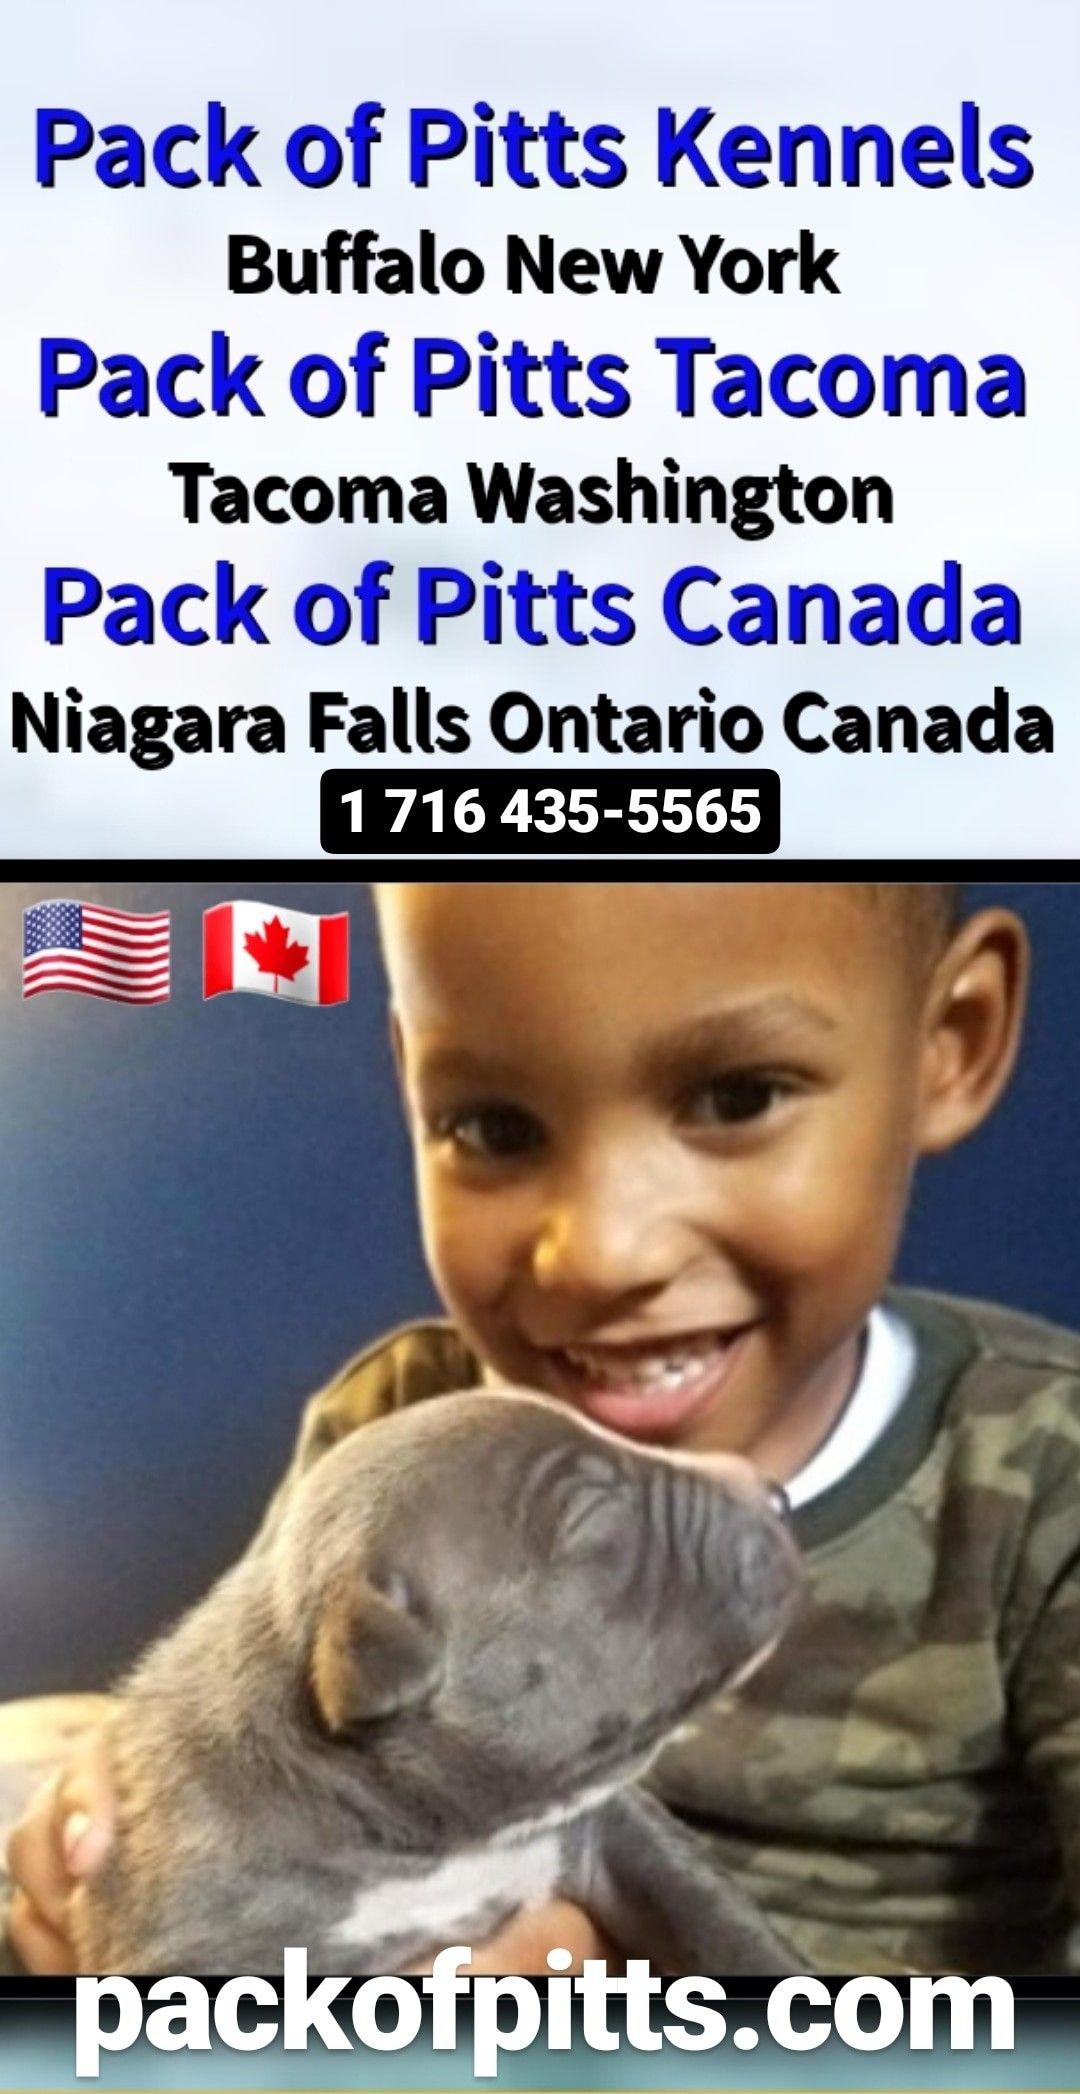 Pack Of Pitts Kennels Buffalo New York Tacoma Washington And